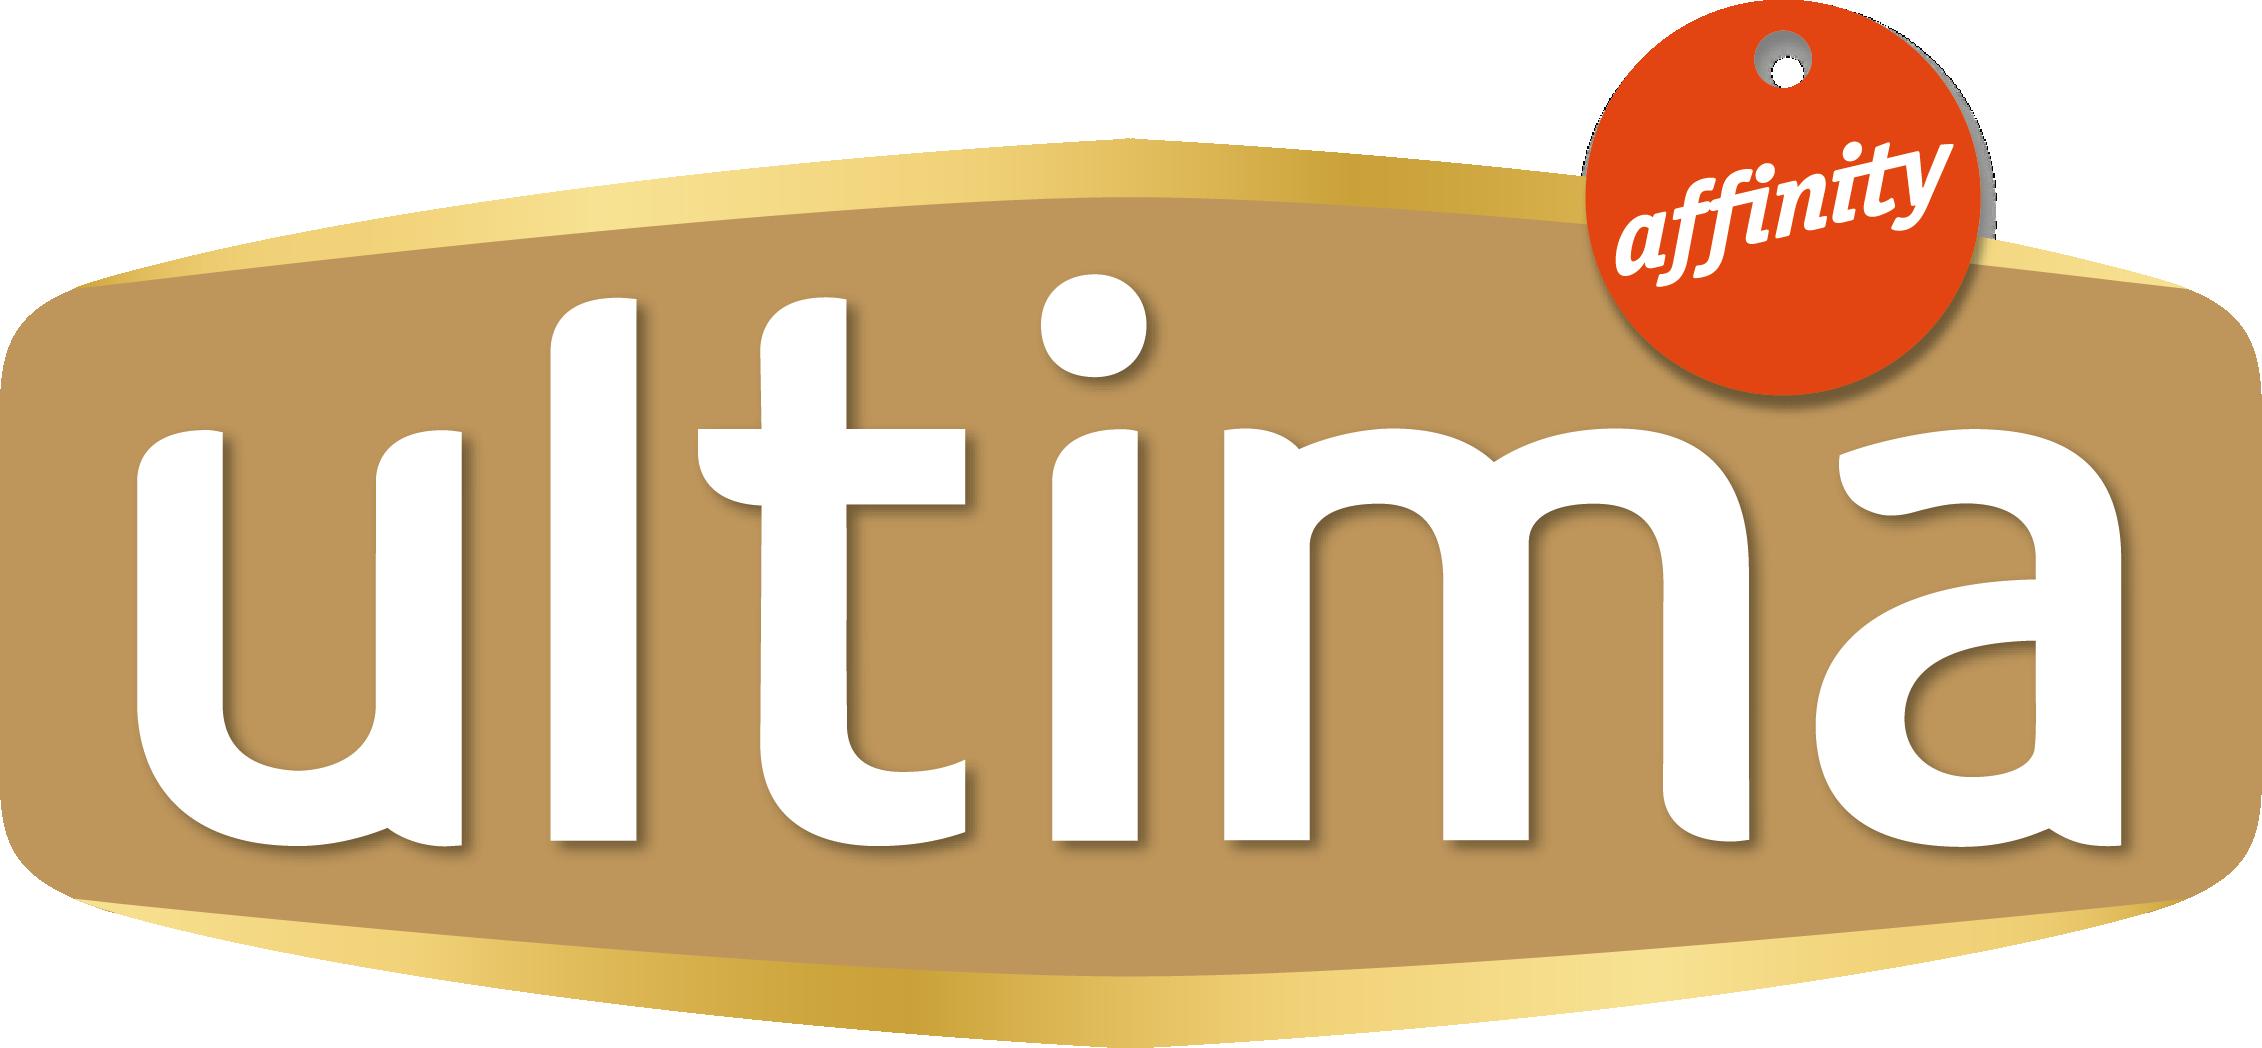 Affinity Ultima